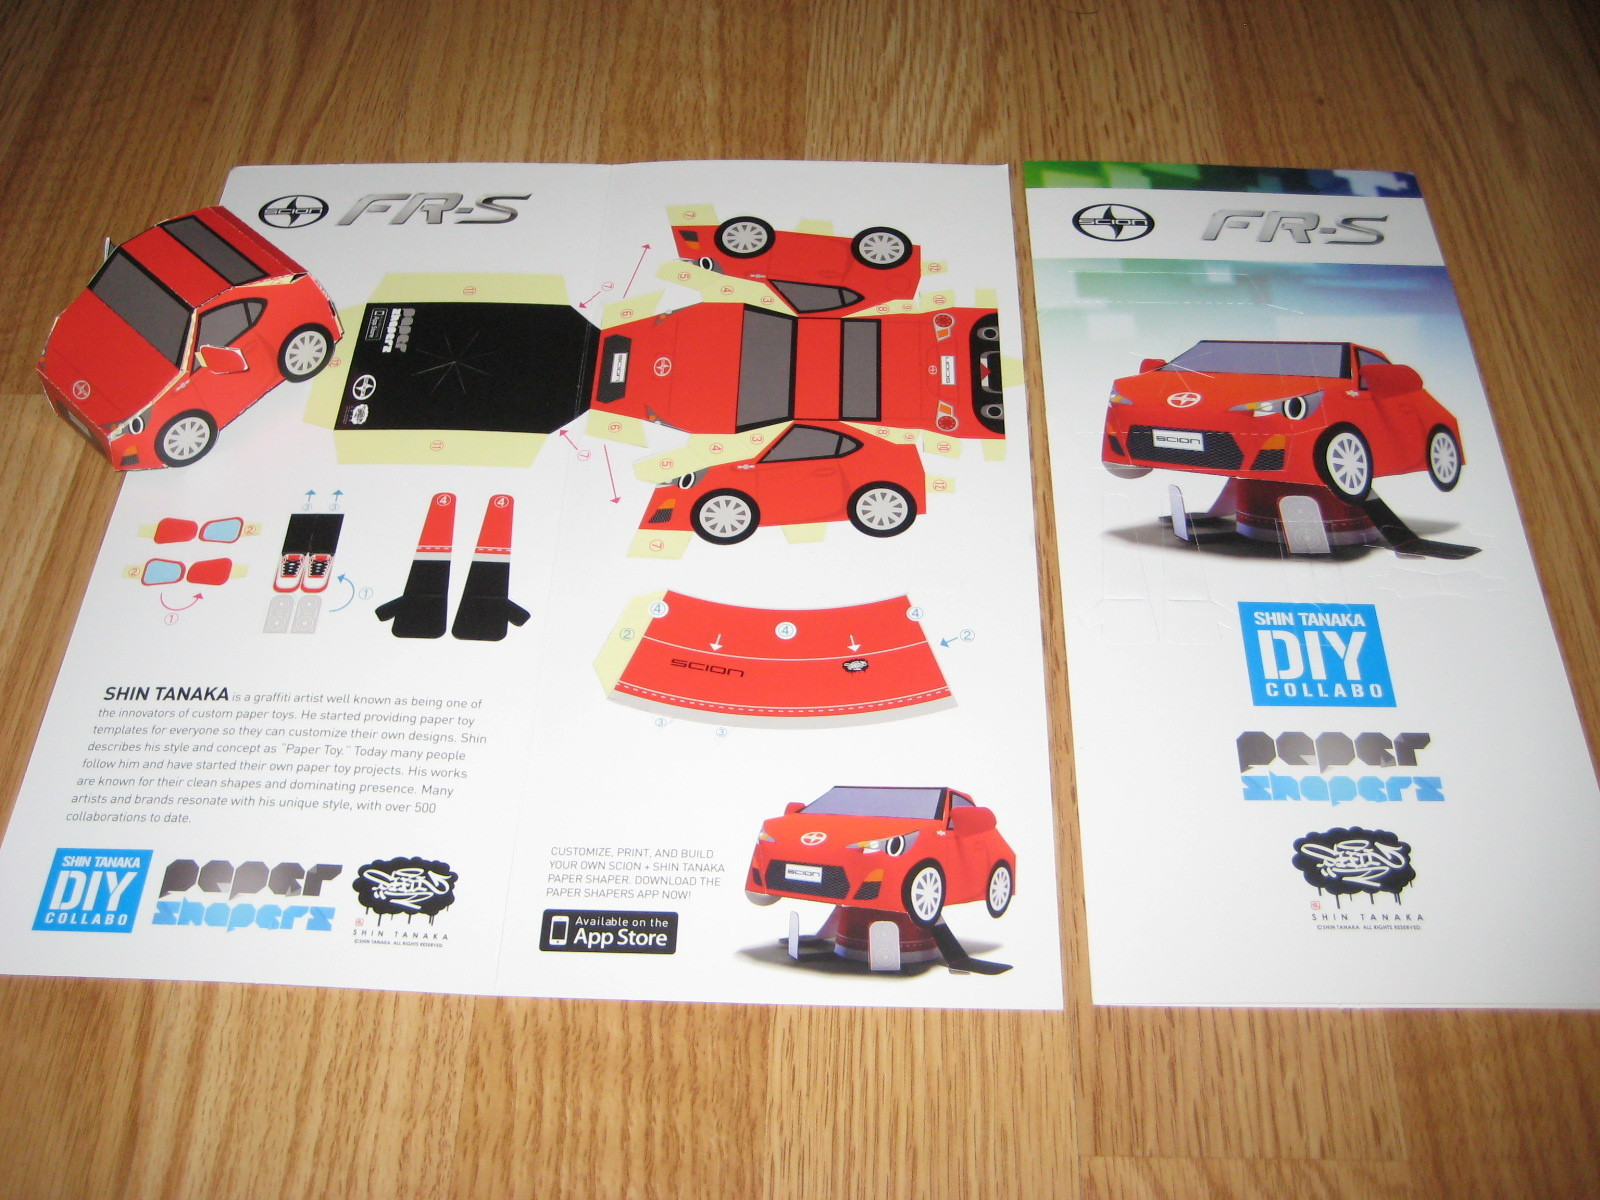 2013 Scion xD Shin Tanaka DIY PAPER SHAPERS brochure catalog US Toyota